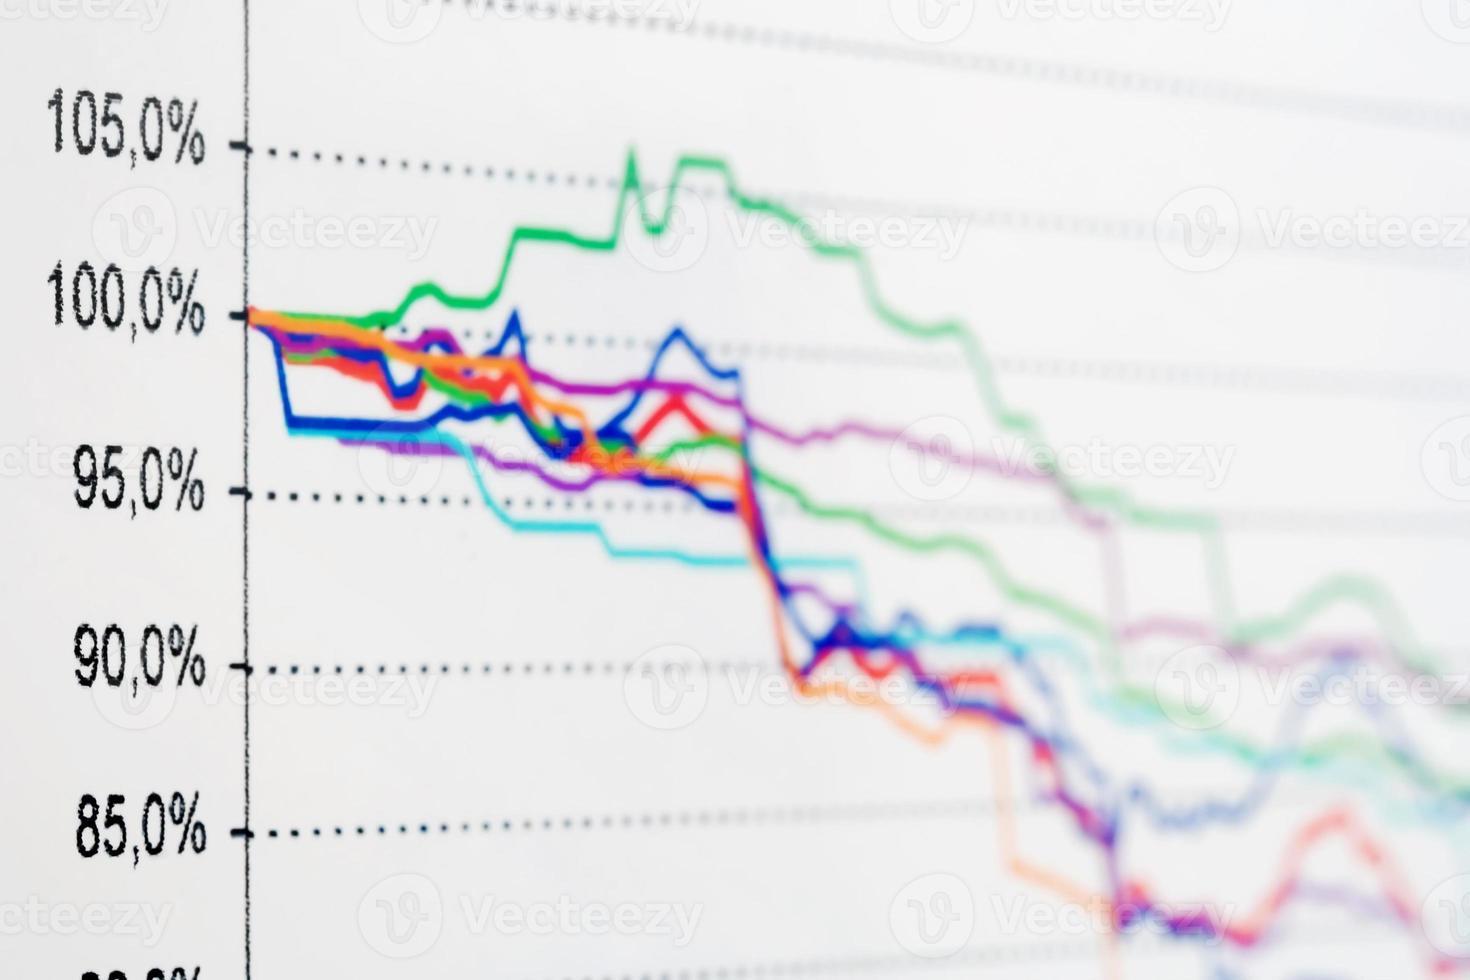 Finanzdiagramme foto